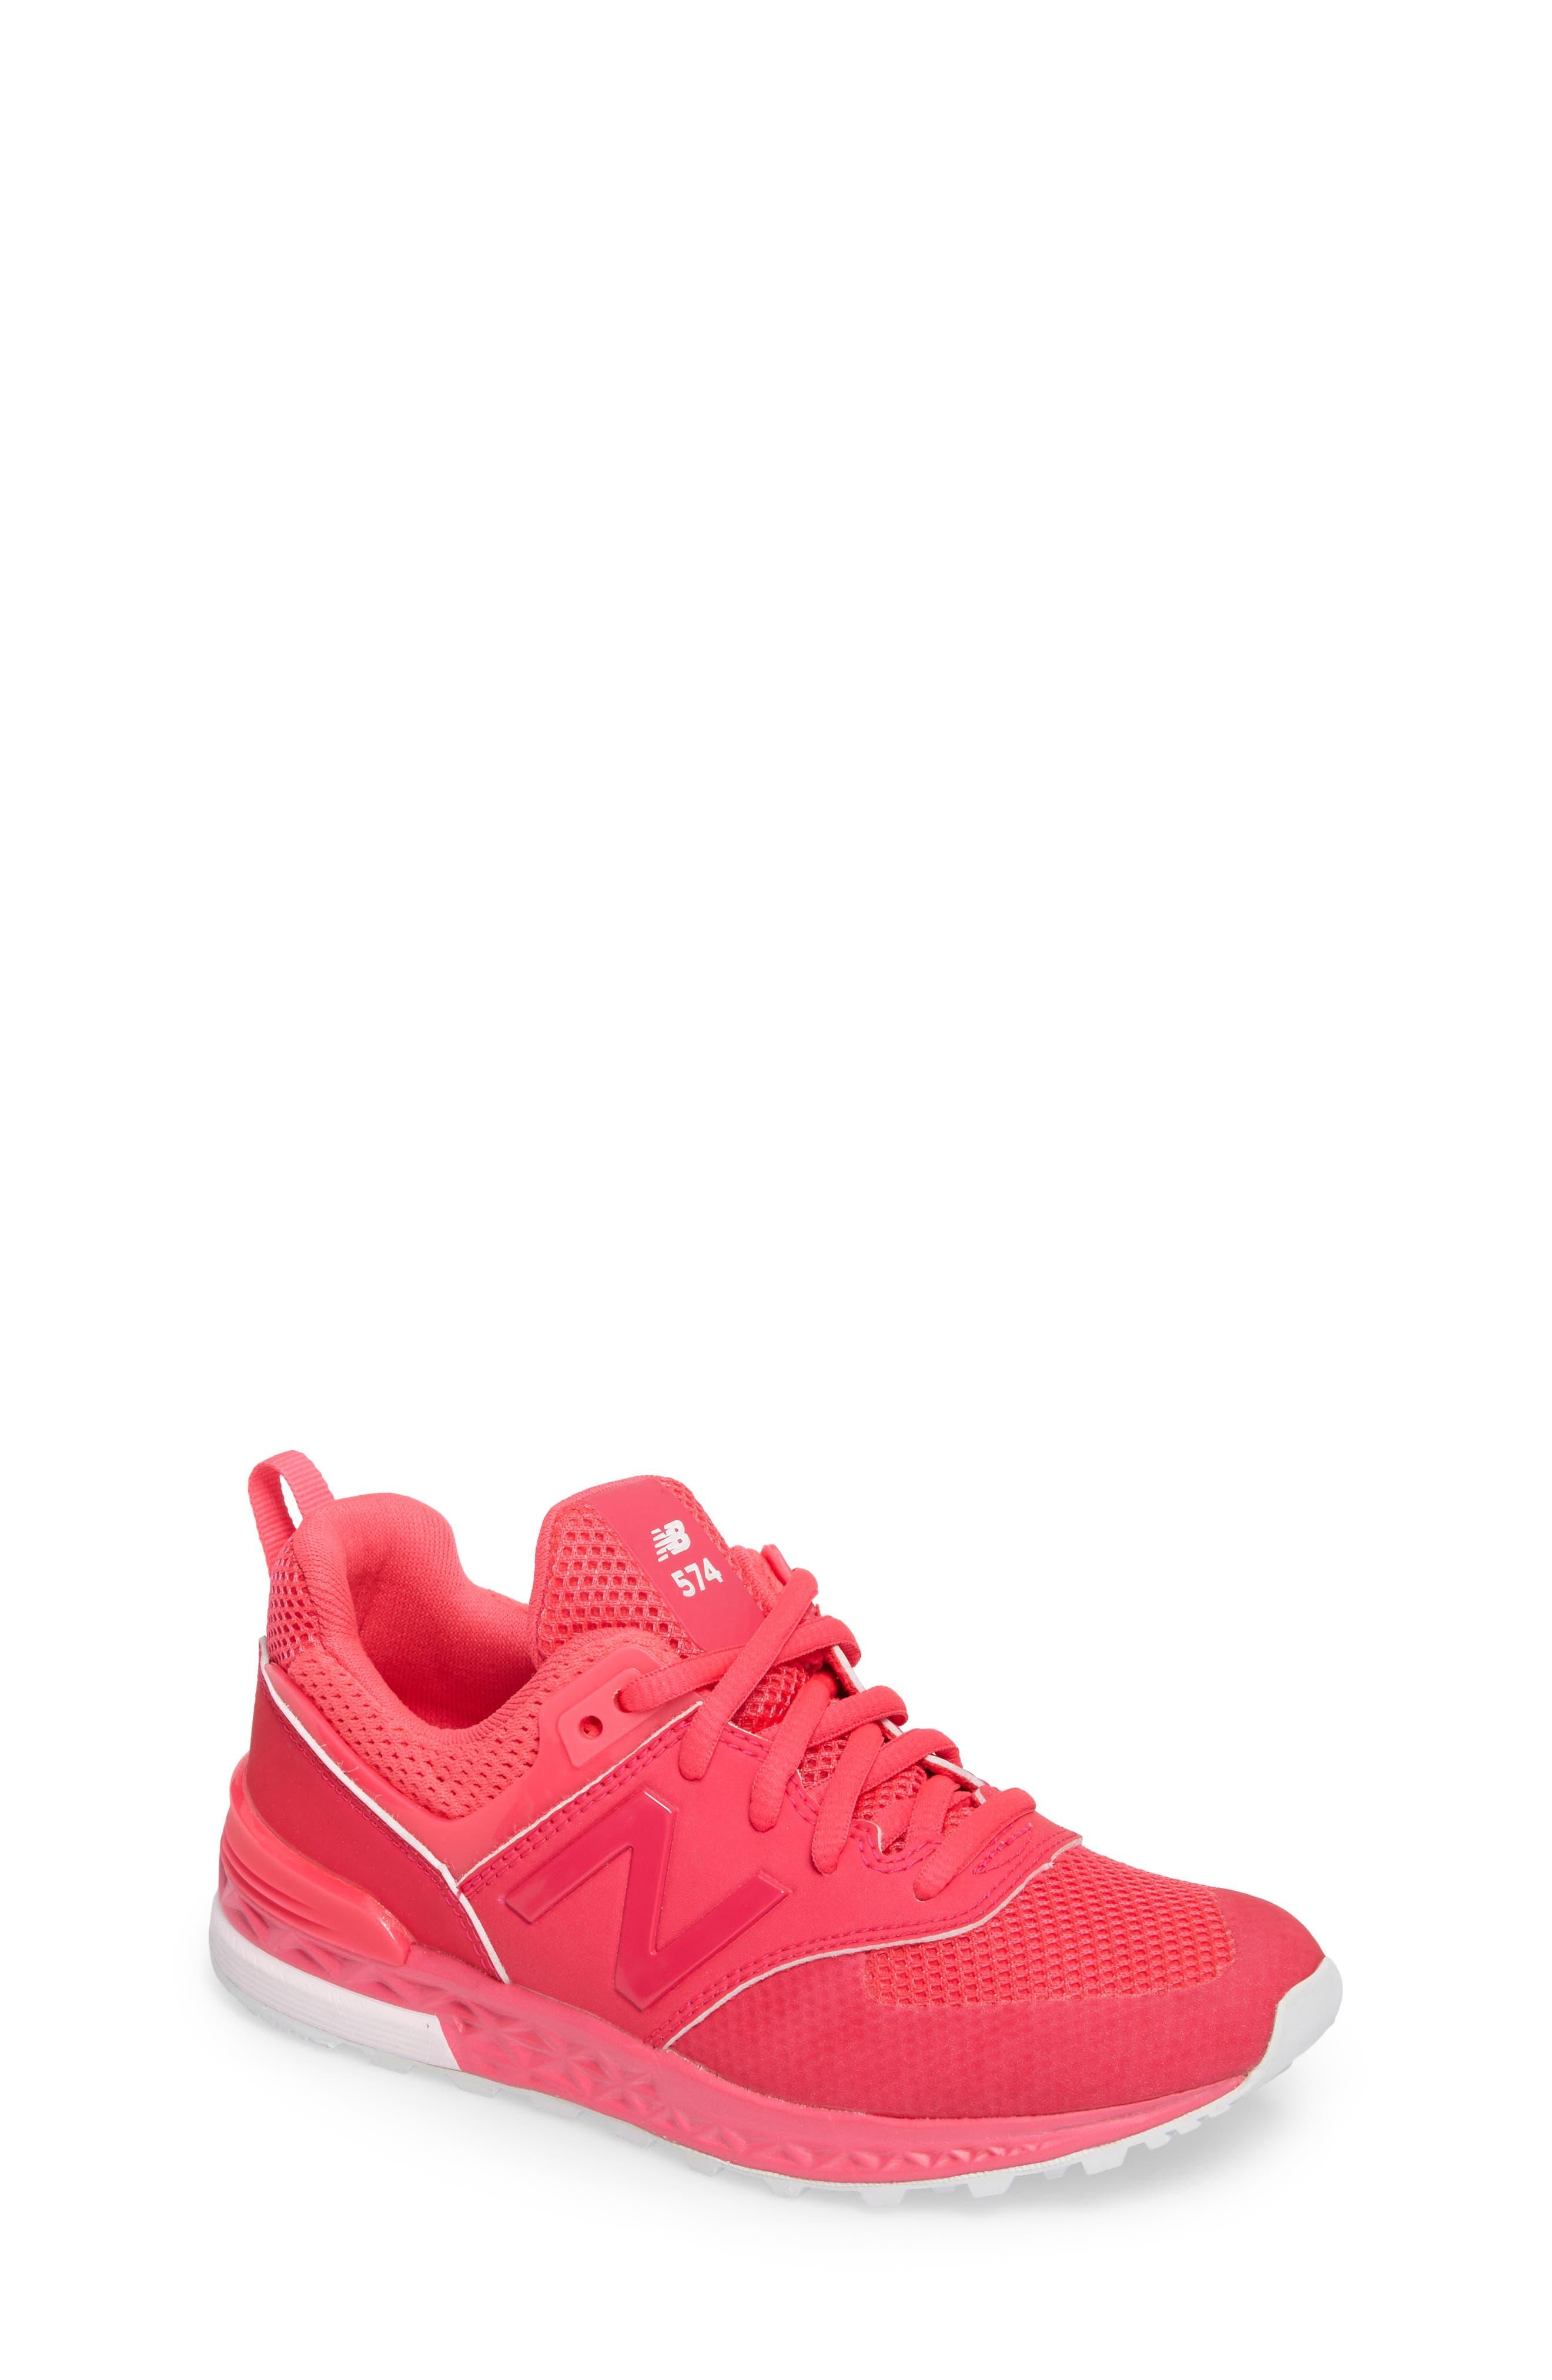 574 v2 Sport Sneaker,                             Main thumbnail 1, color,                             660